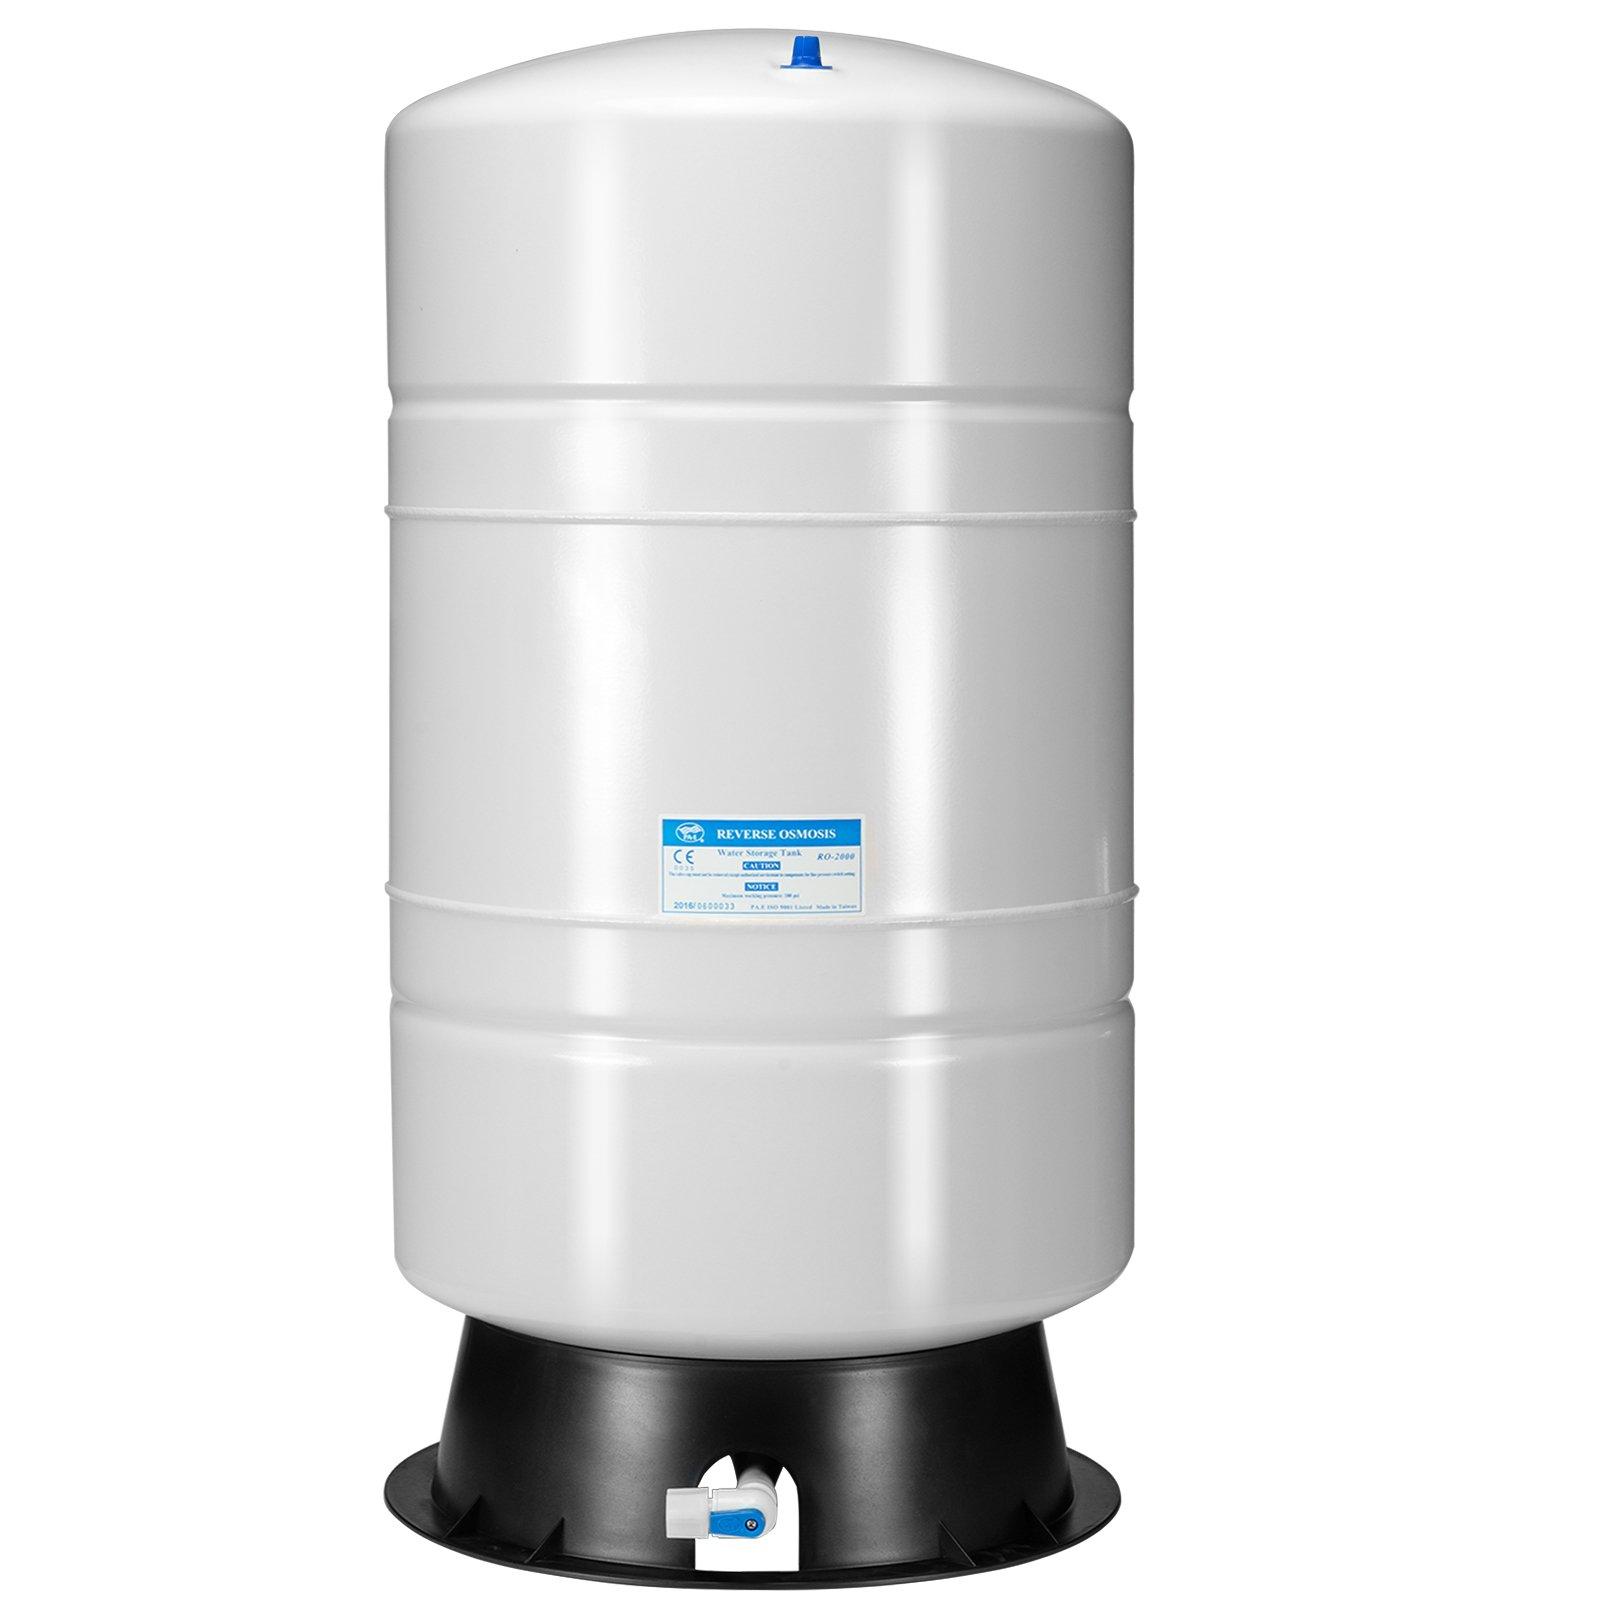 iSpring 20 gallon tank with 14 gallon Storage Capacity Reserve Osmosis Water Storage Tank